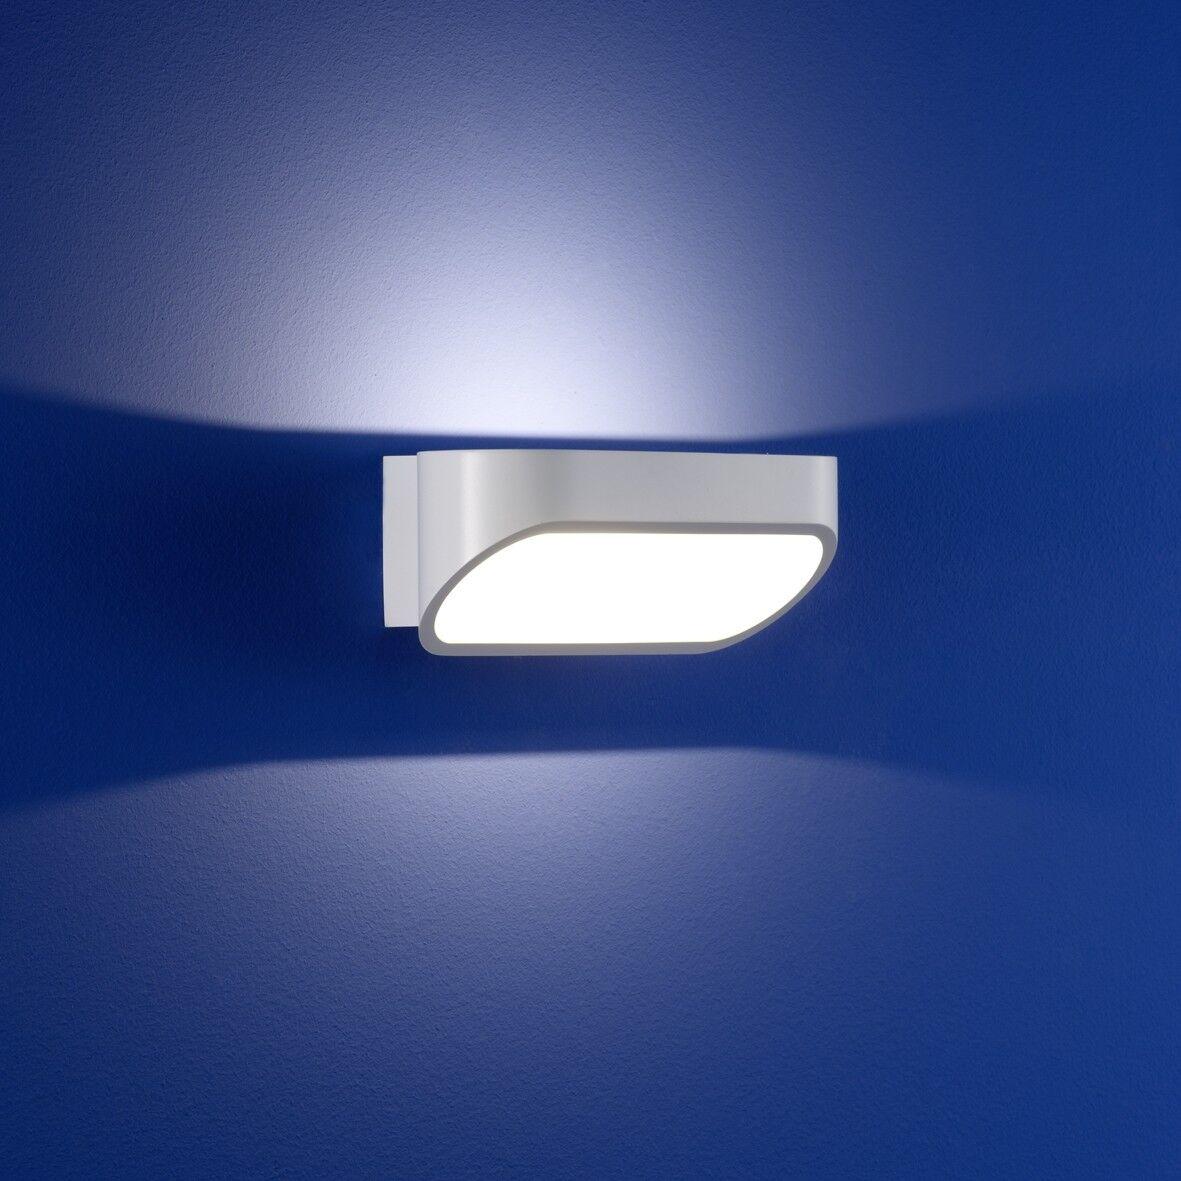 Deutsche LED Lampada Lampada Lampada da parete Bianco 6 Watt Lampada Parete UP & DOWN 7302b0